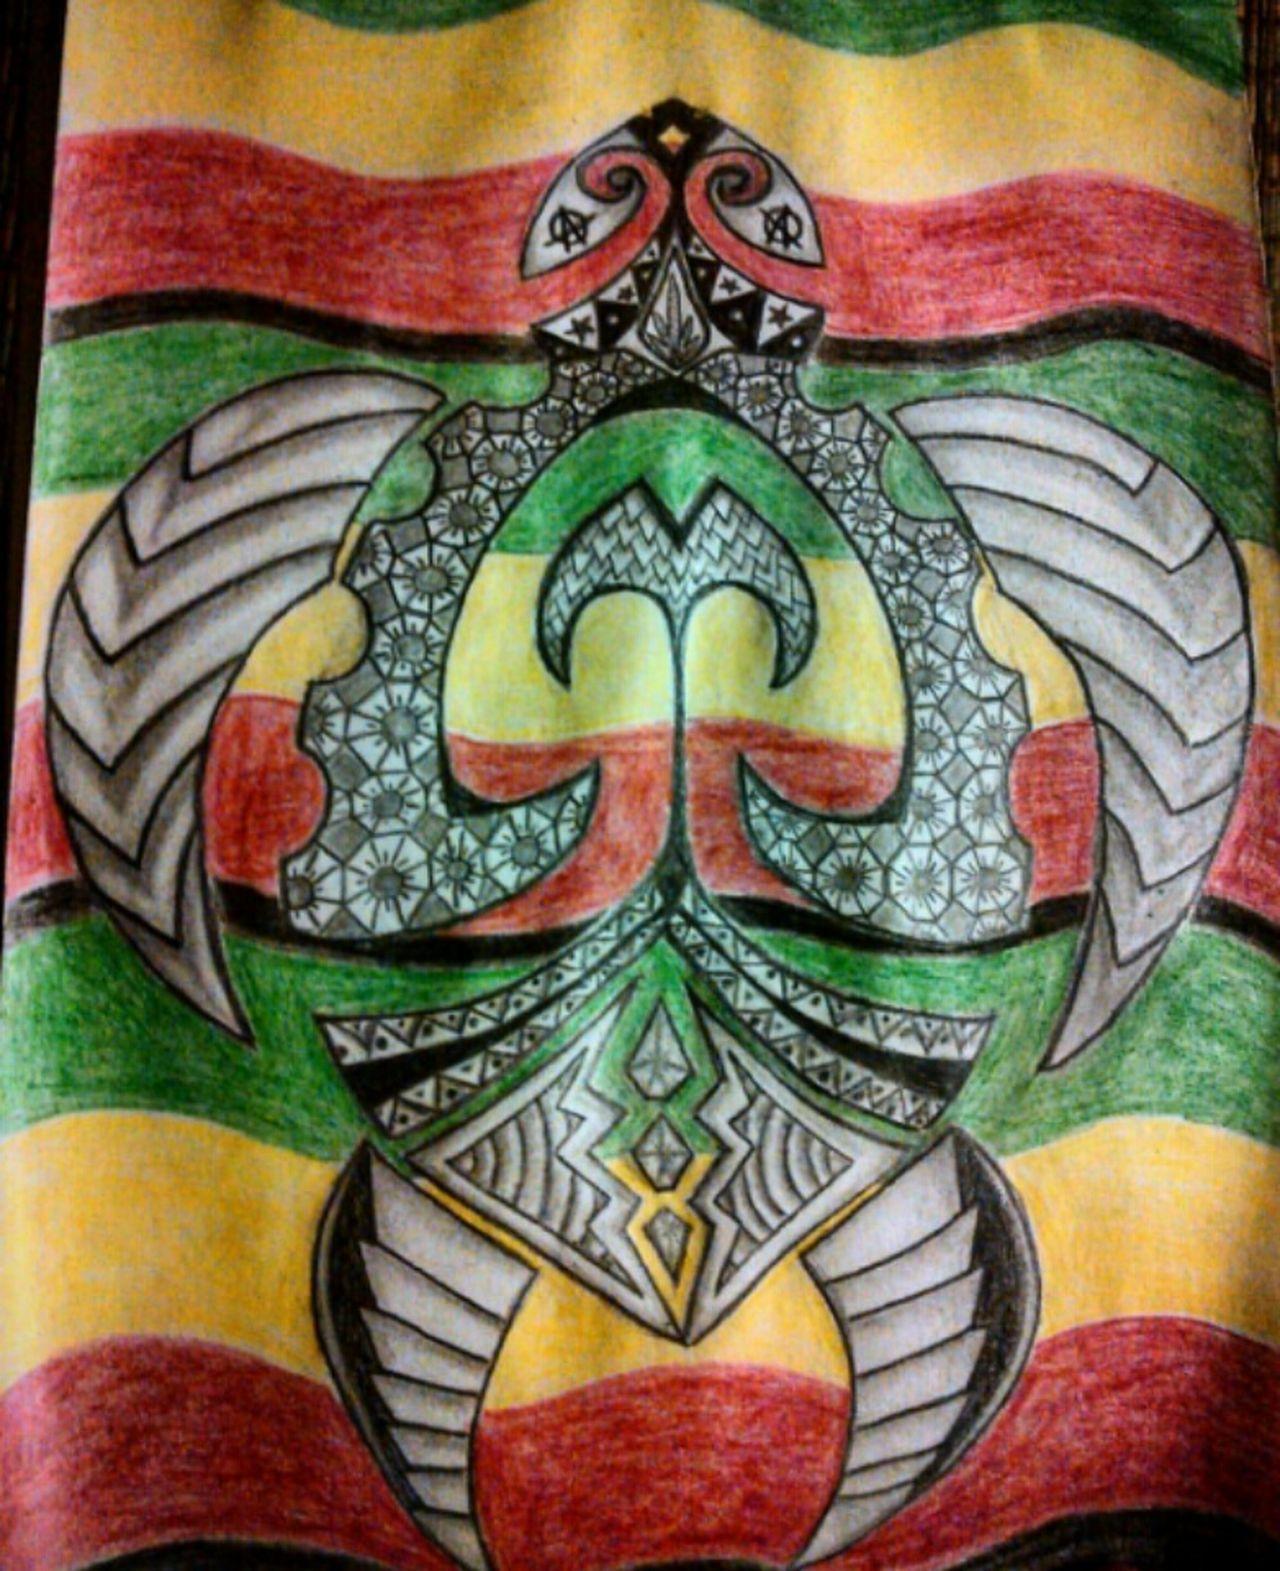 Turtle Turtles I Love Turtles Drawing Colored Pencils Shading Art ArtWork Art, Drawing, Creativity Creativity Geometric Patterns Patterns RASTA Hippy Art